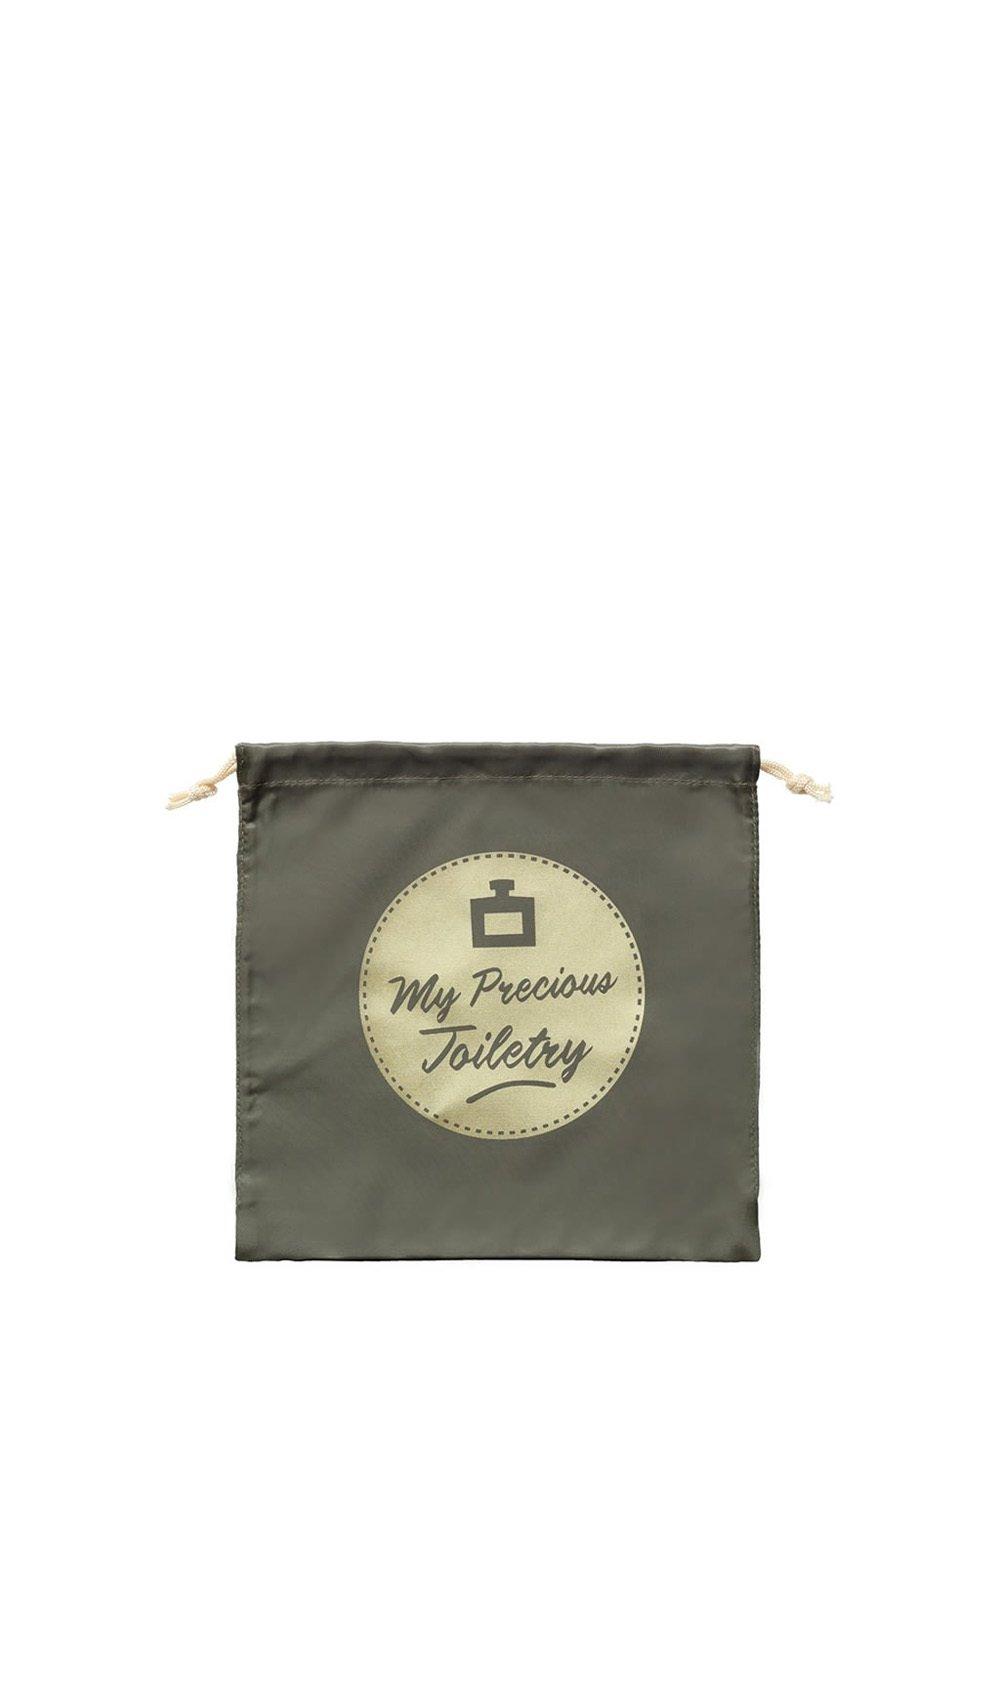 Cathy ds paris Clutch bag MY PRECIOUS TOILETRY Khaki Women Spring/Summer Collection